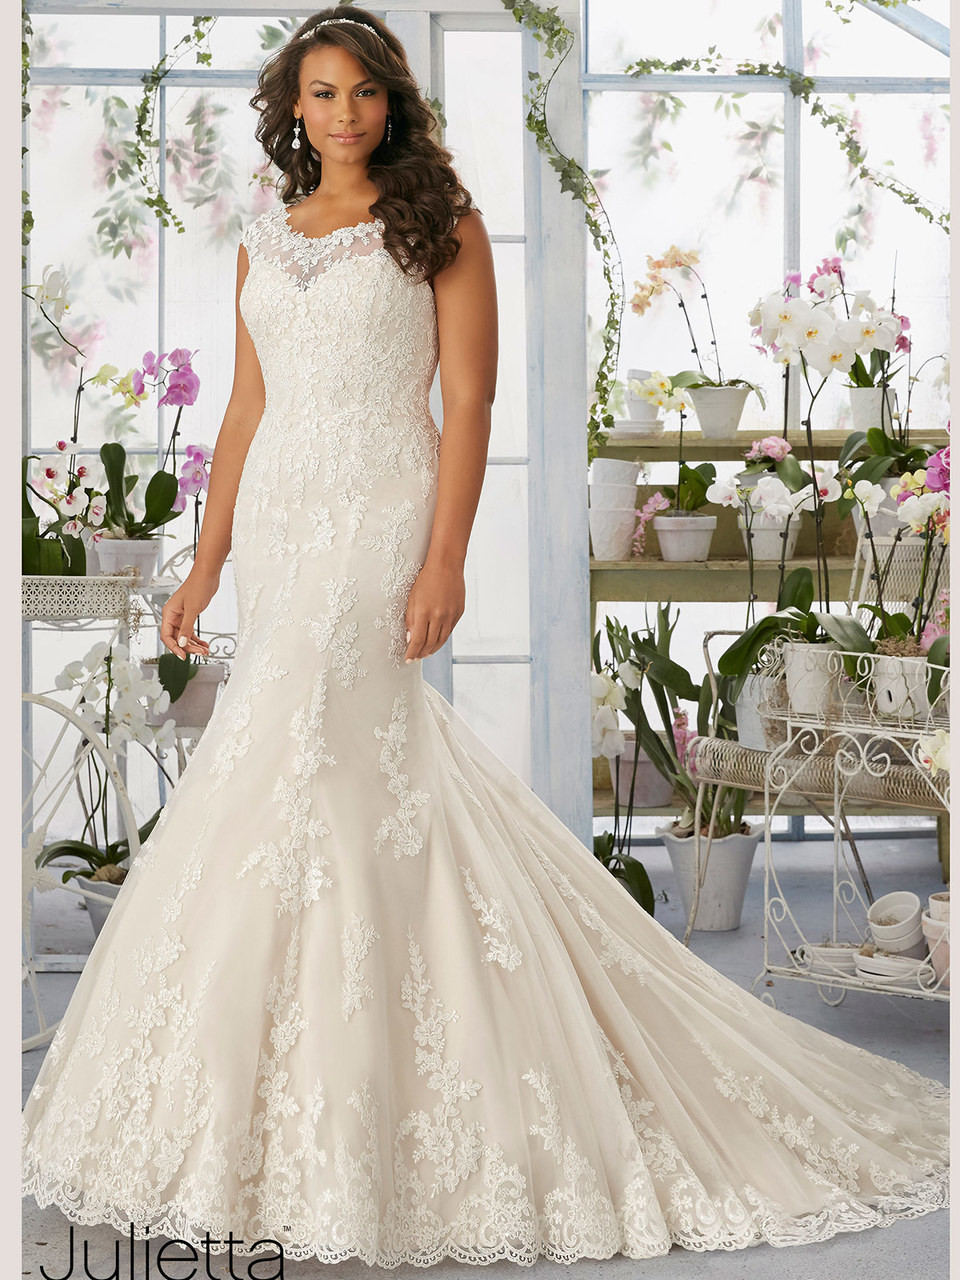 Mori Lee Bridal Dresses Price Range Ficts